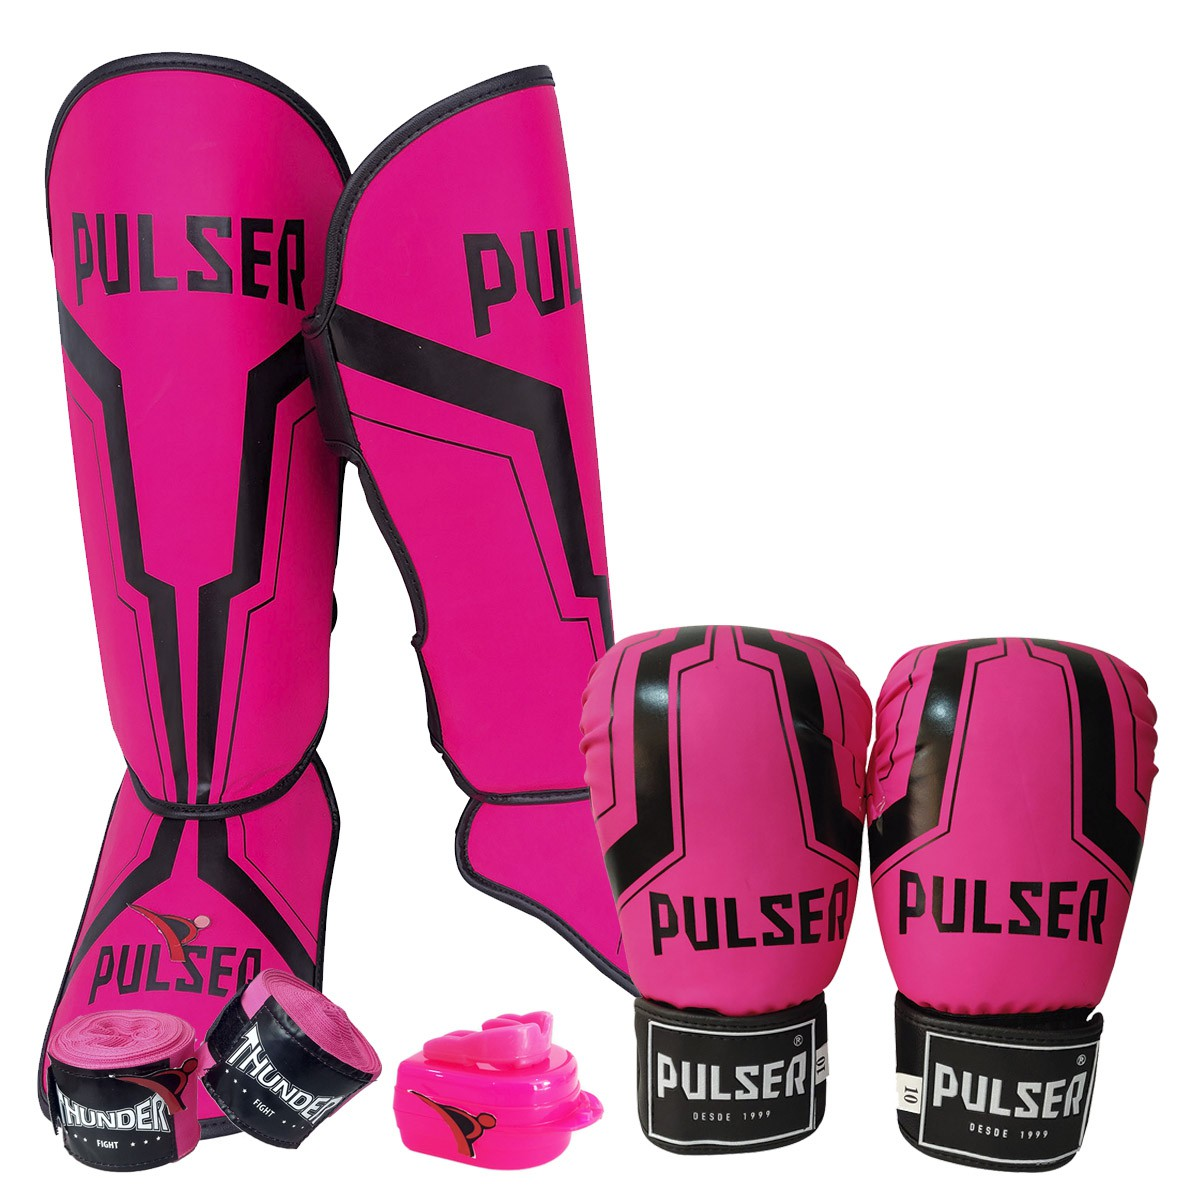 Kit de Muay Thai / Kickboxing Feminino 12oz - Rosa Iron - Pulser  - PRALUTA SHOP